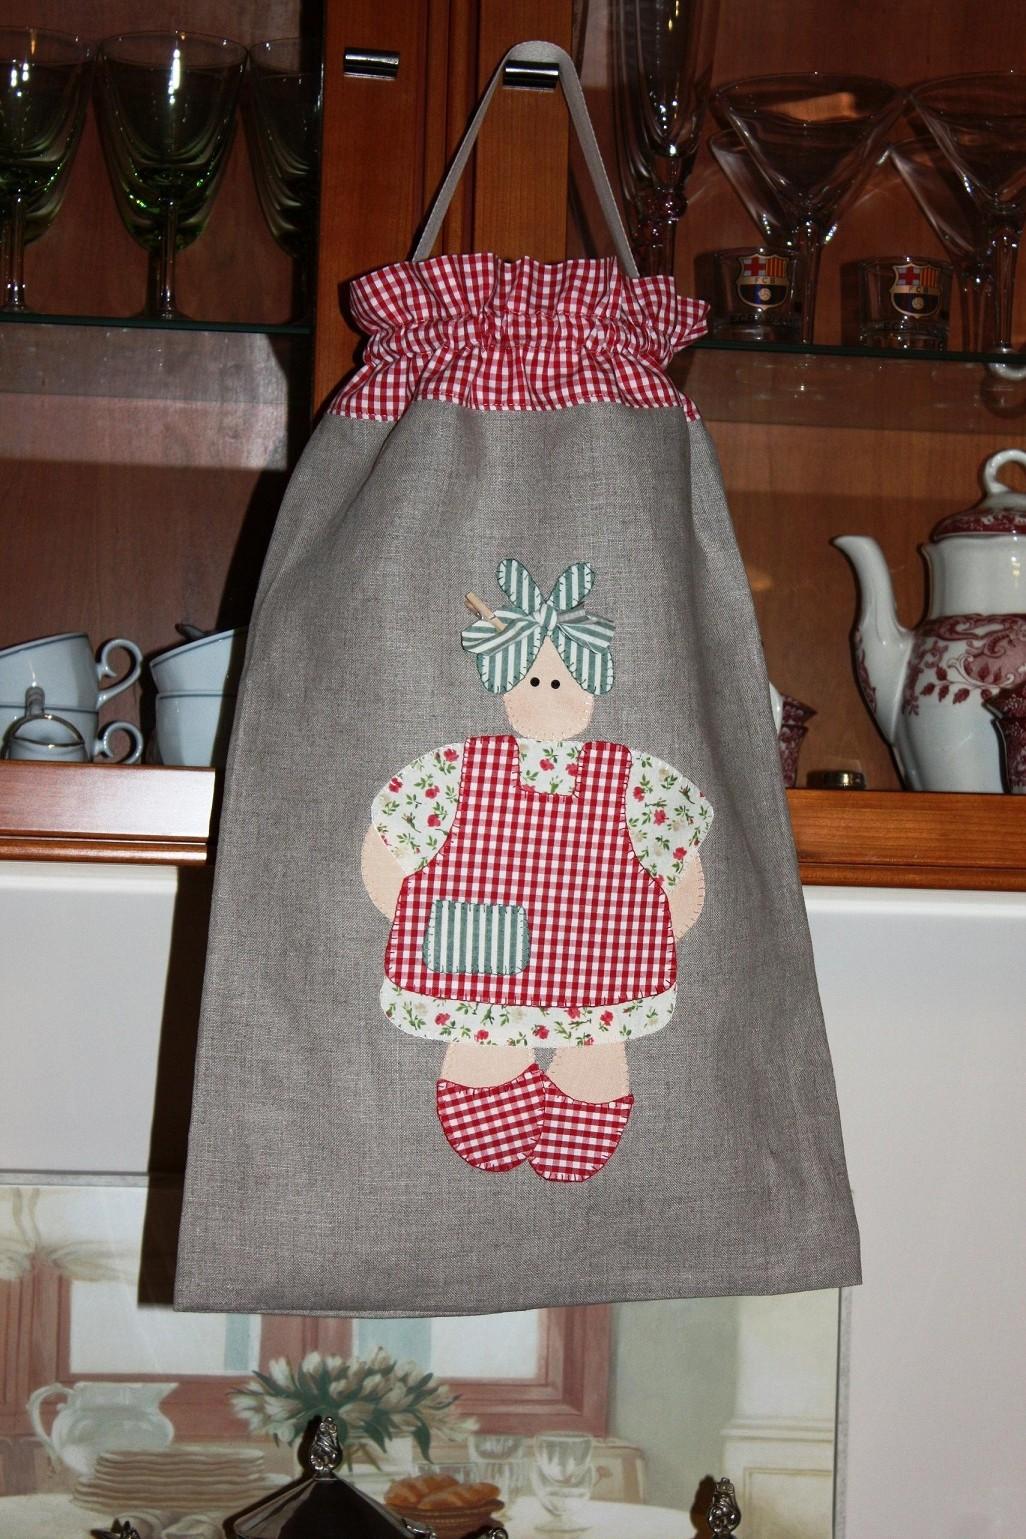 Manualidades quilting y patchwork bolso para guardar - Manualidades patchwork bolsos ...